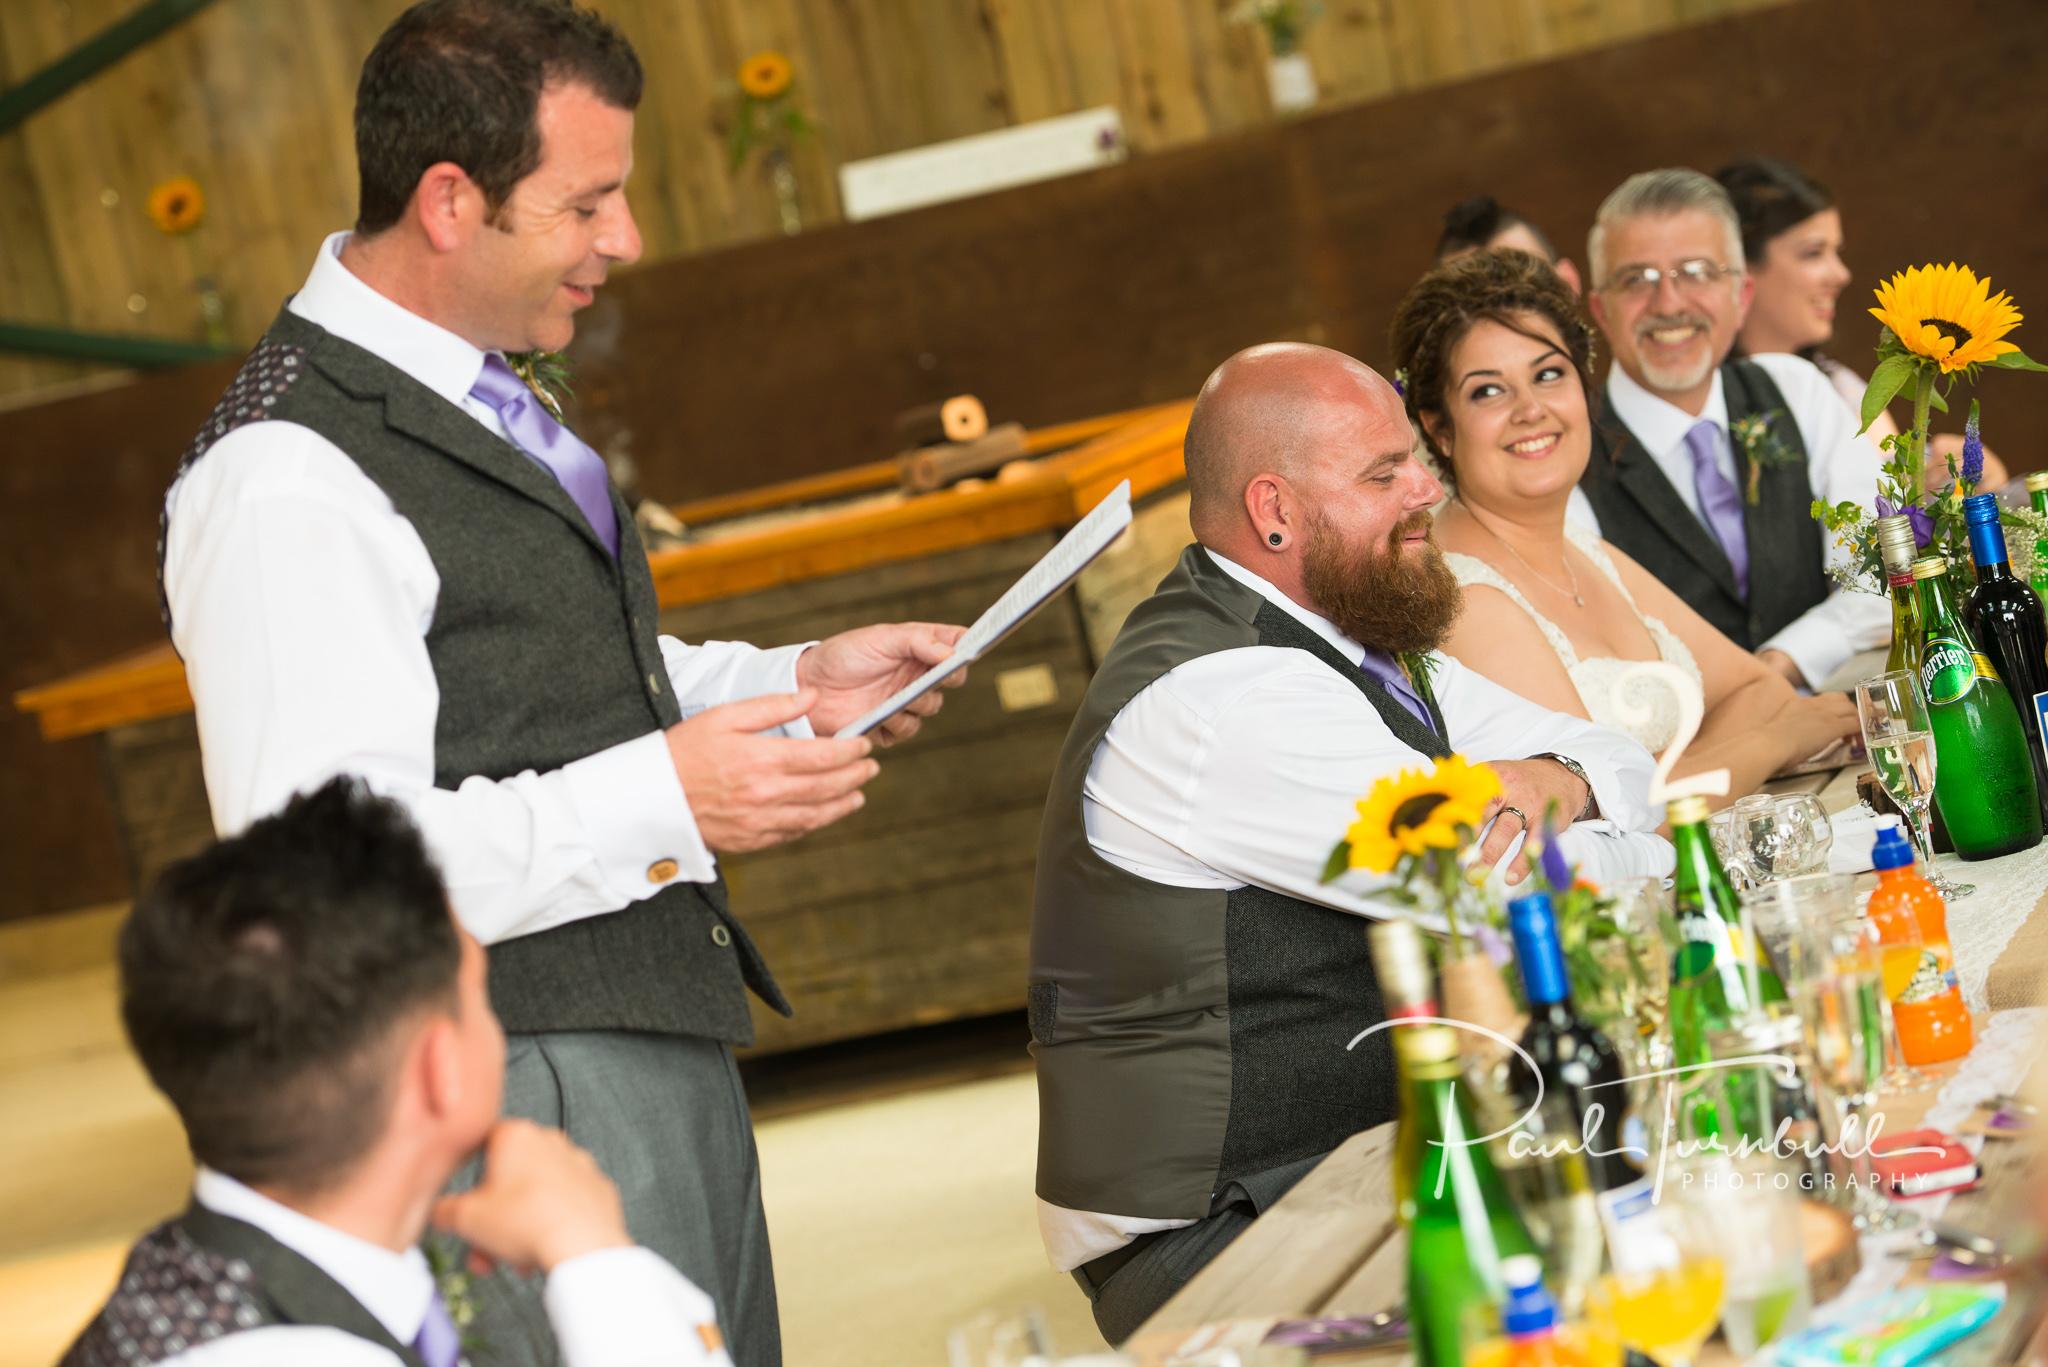 wedding-photographer-hilltop-farm-ilton-yorkshire-048.jpg